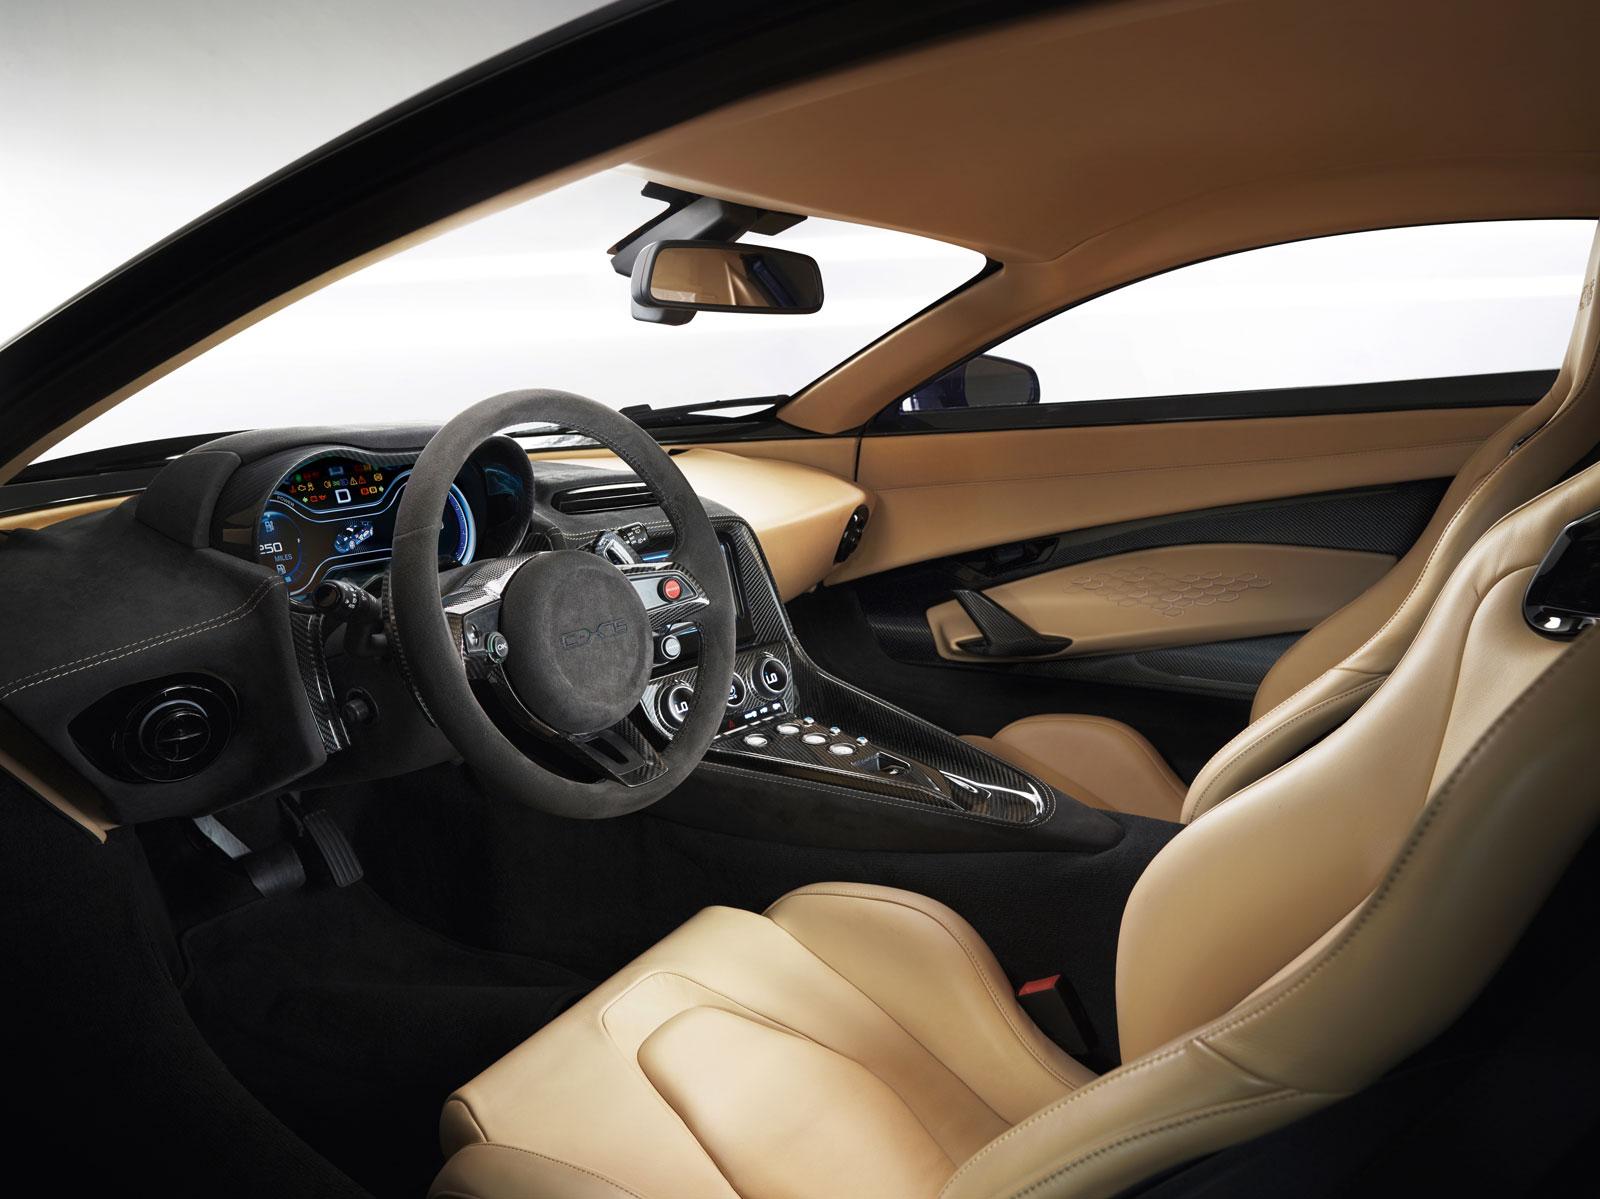 jaguar c x75 interior car body design. Black Bedroom Furniture Sets. Home Design Ideas